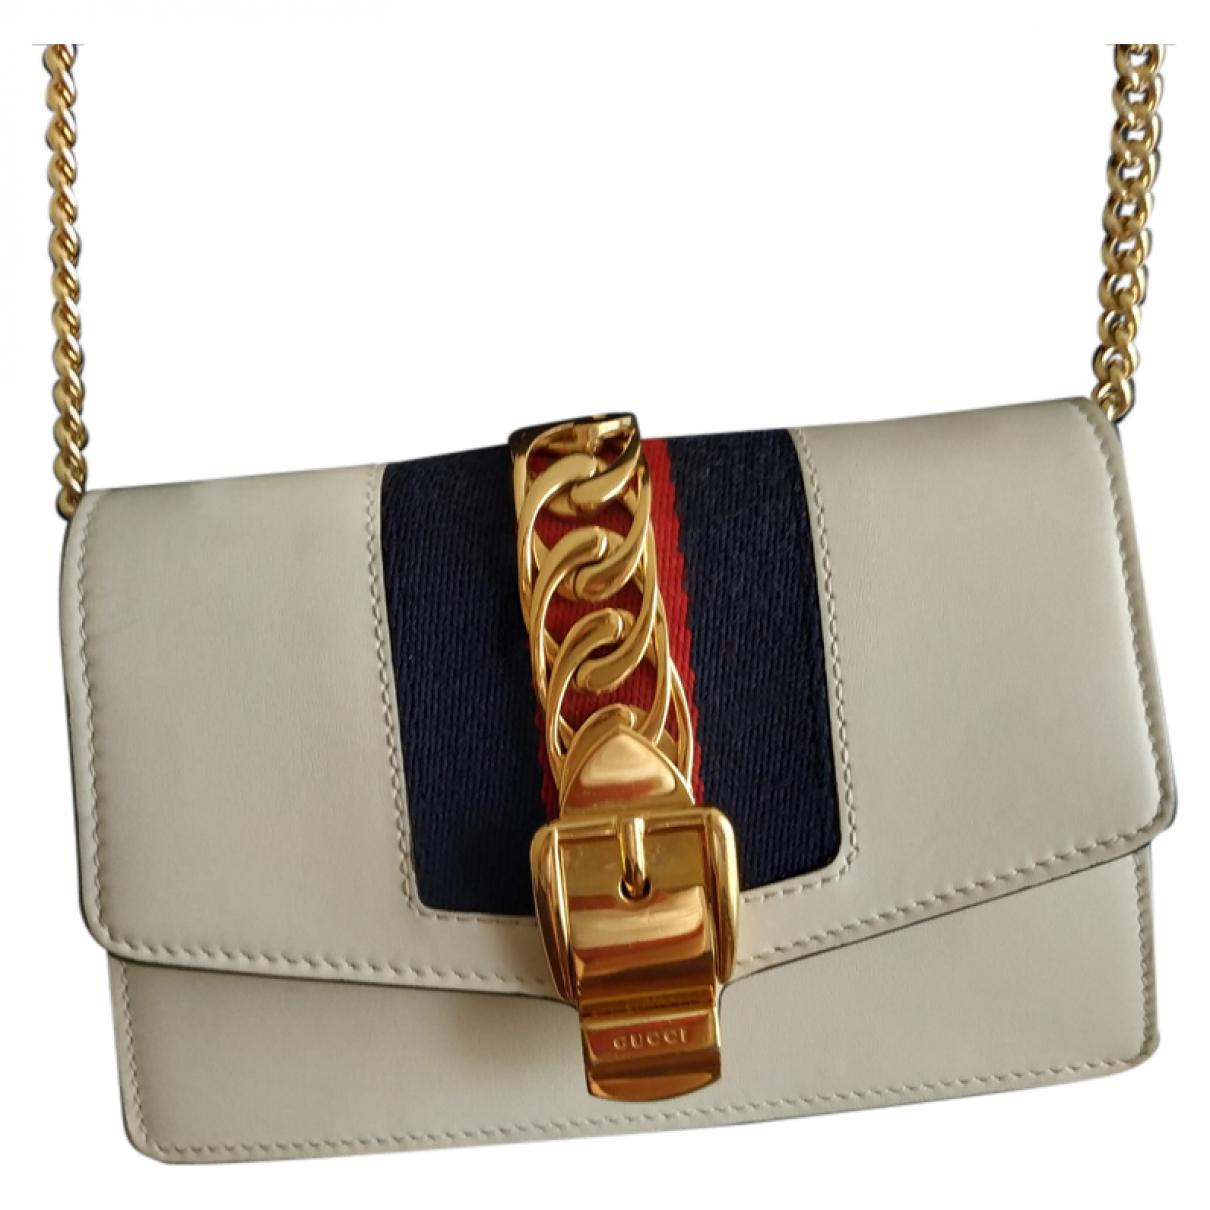 Gucci Sylvie Beige Leather handbag for Women \N